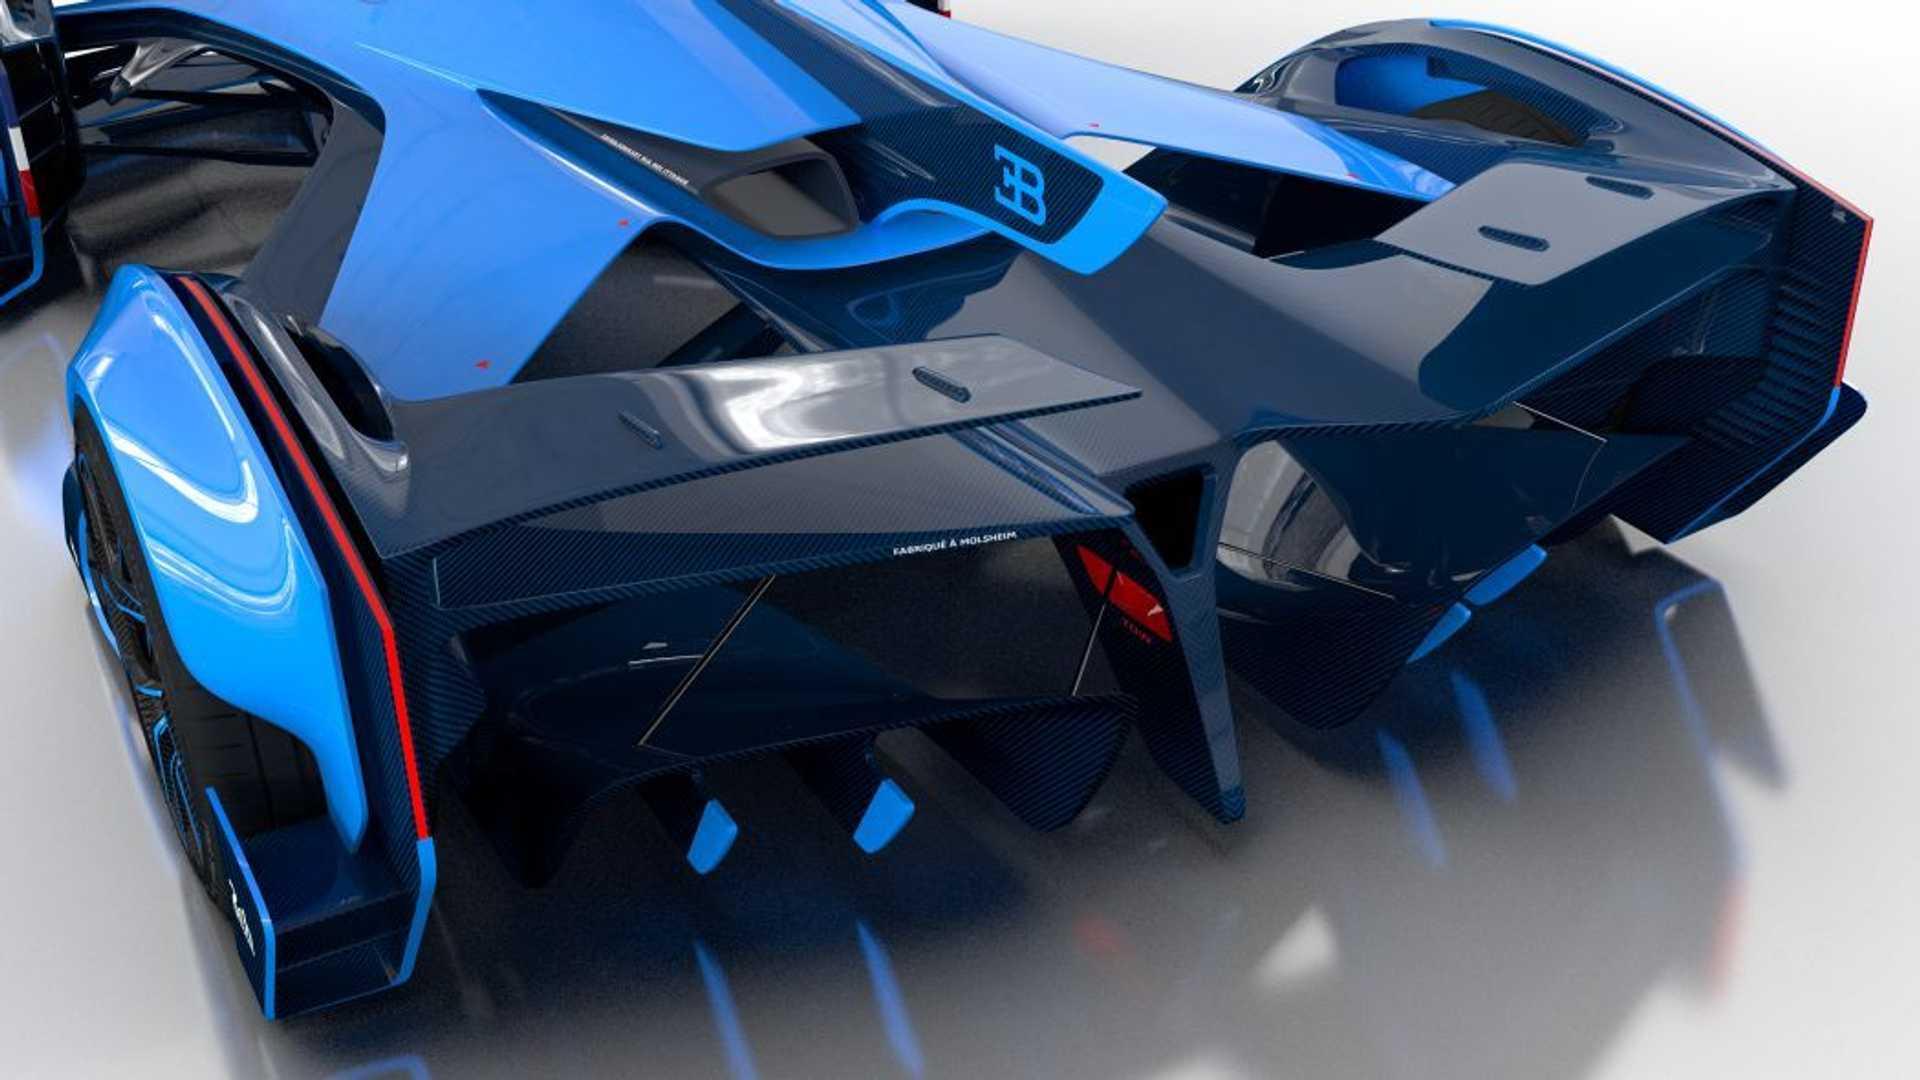 amazing Bugatti Vision Le Mans image